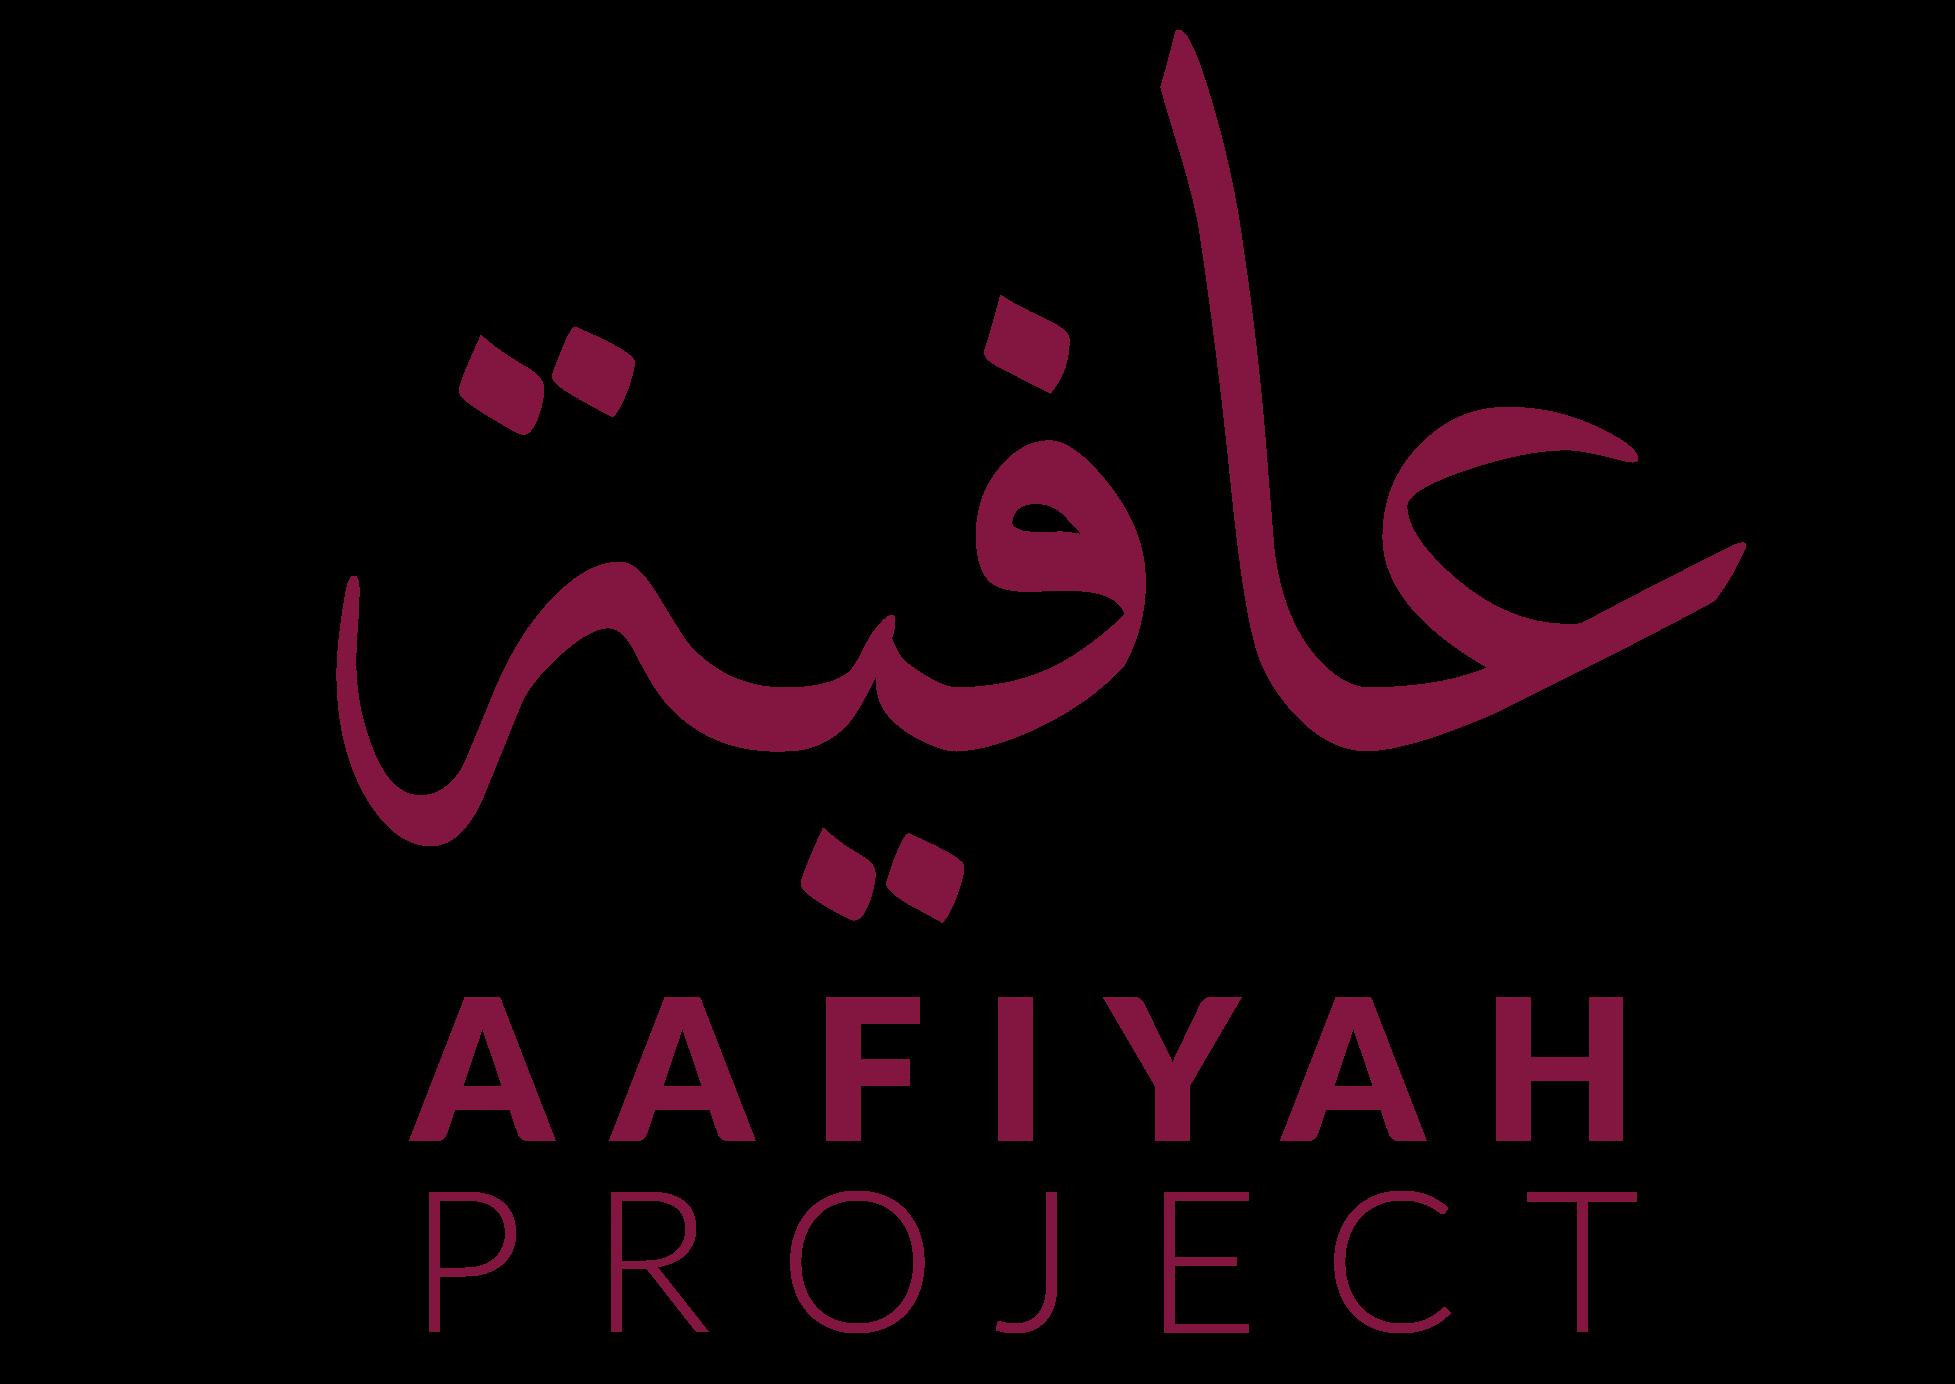 The Aafiyah Project